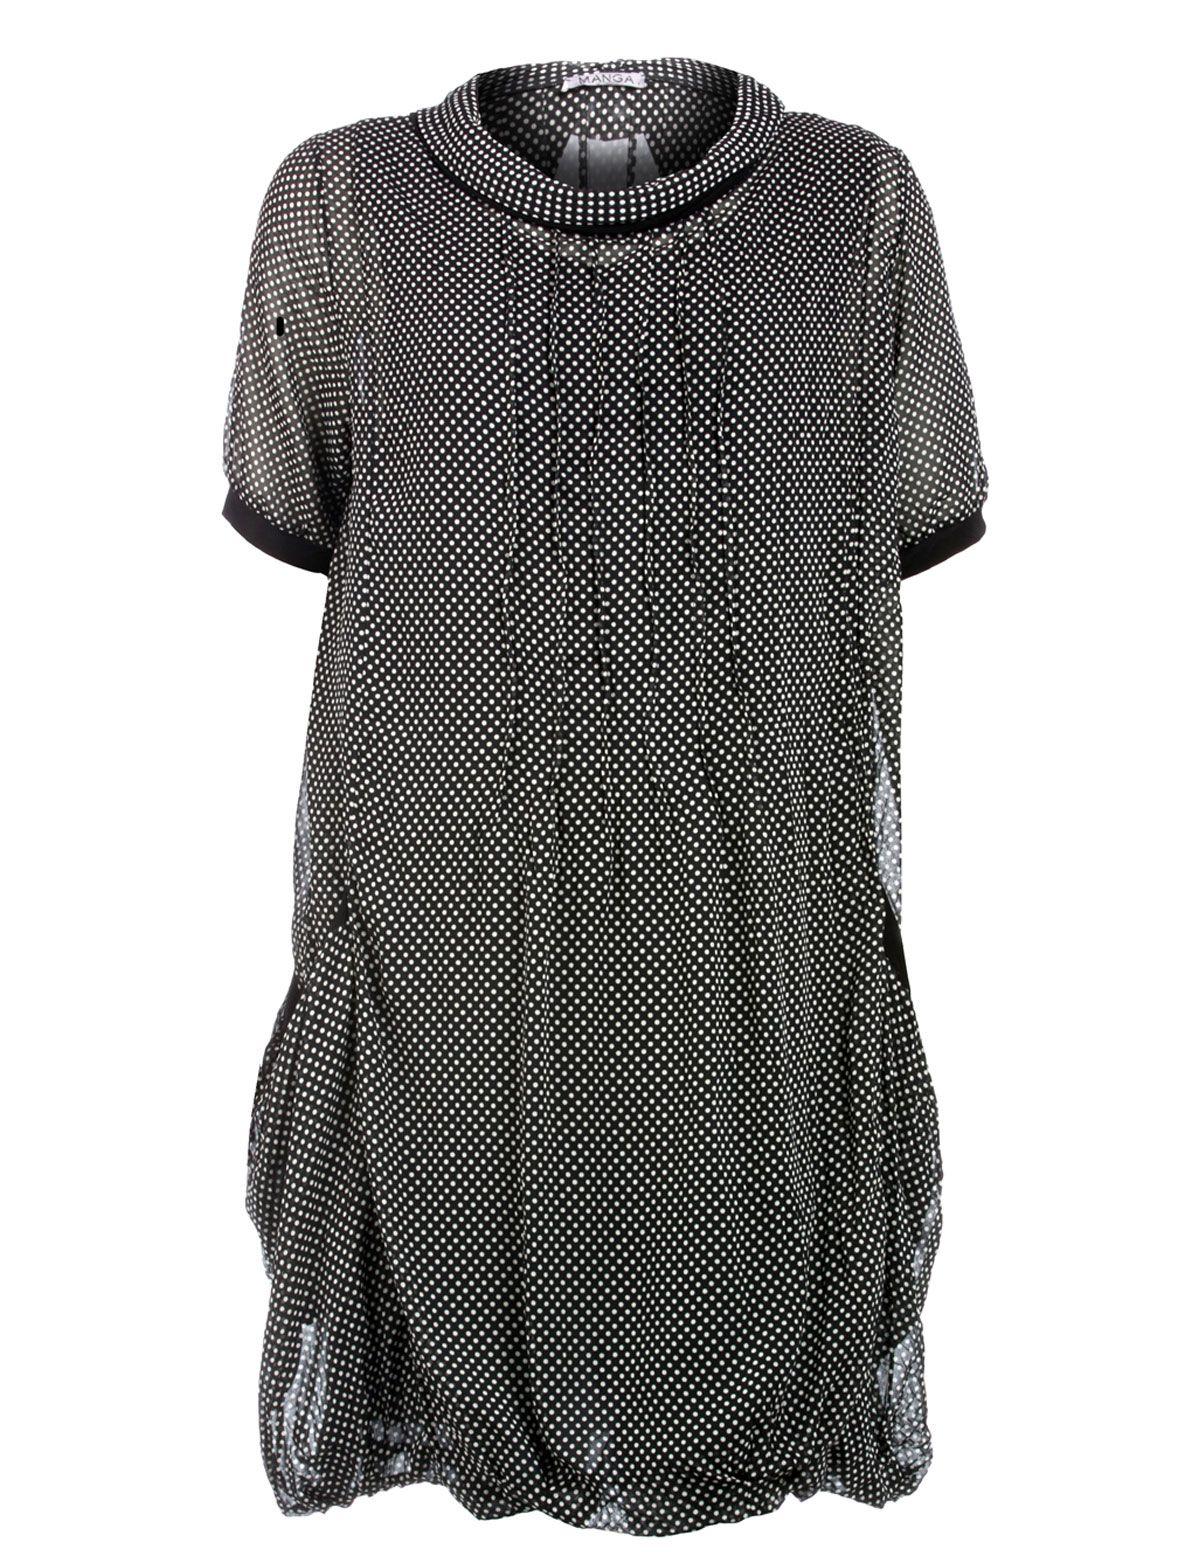 MANGA - Dotted Seide-Mischung Chiffon-Kleid - navabi  Kleidung, Seide